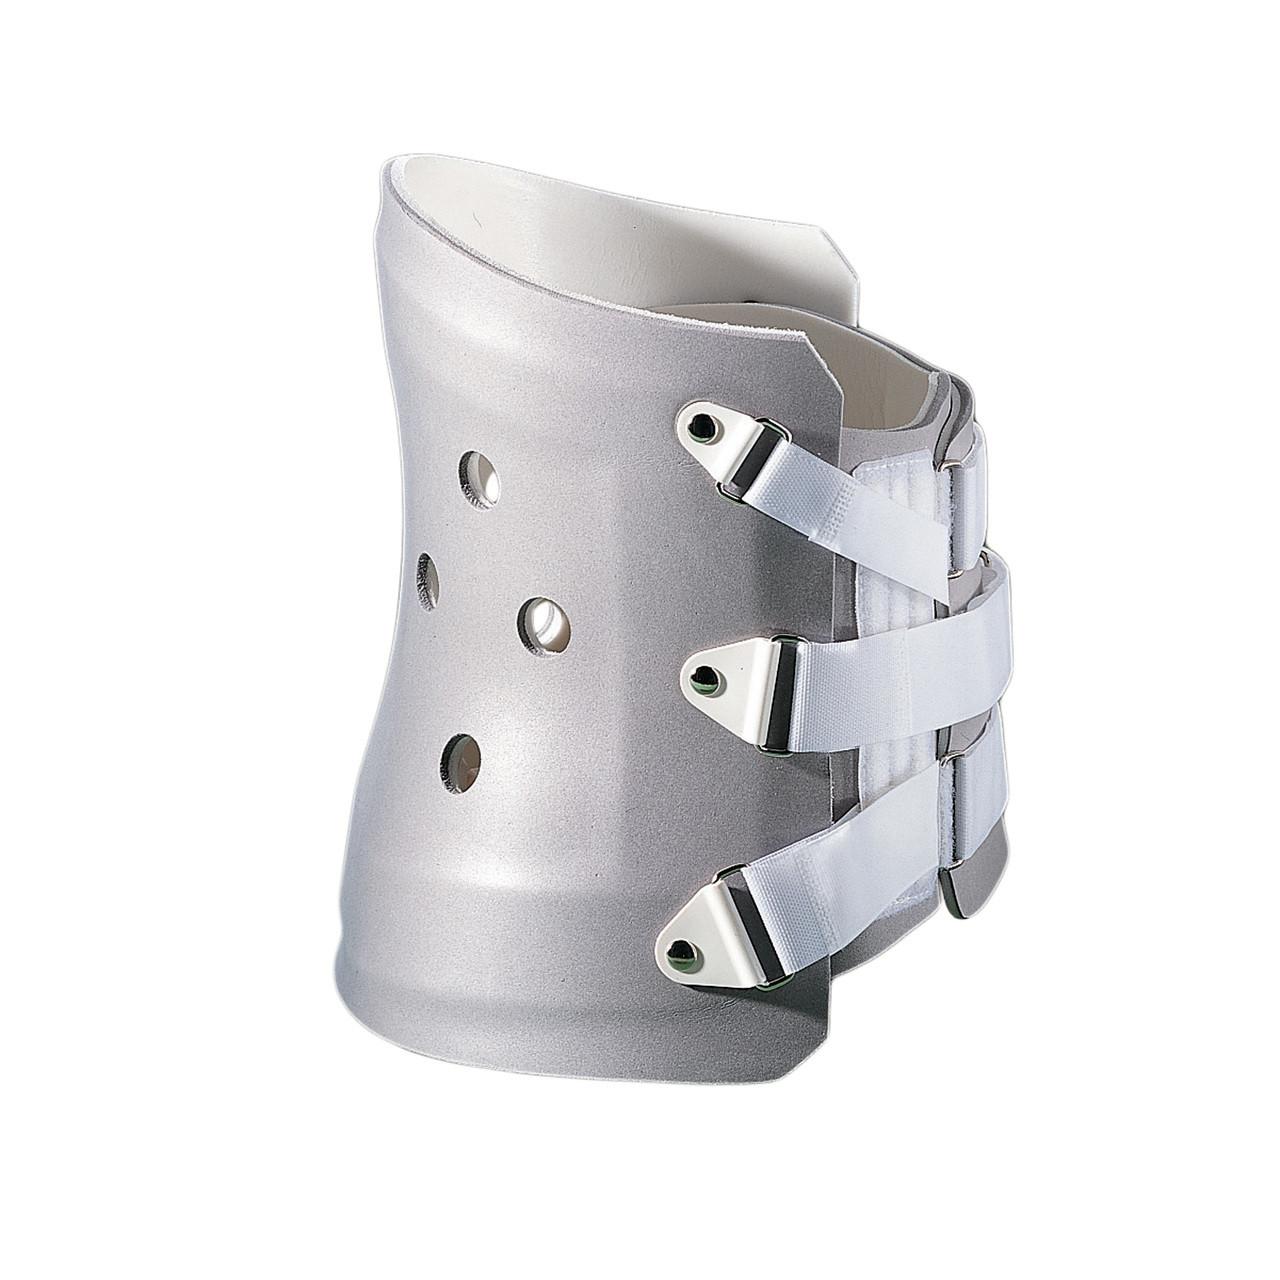 Freeman Combo Lumbar-Sacral Orthosis (LSO) Brace